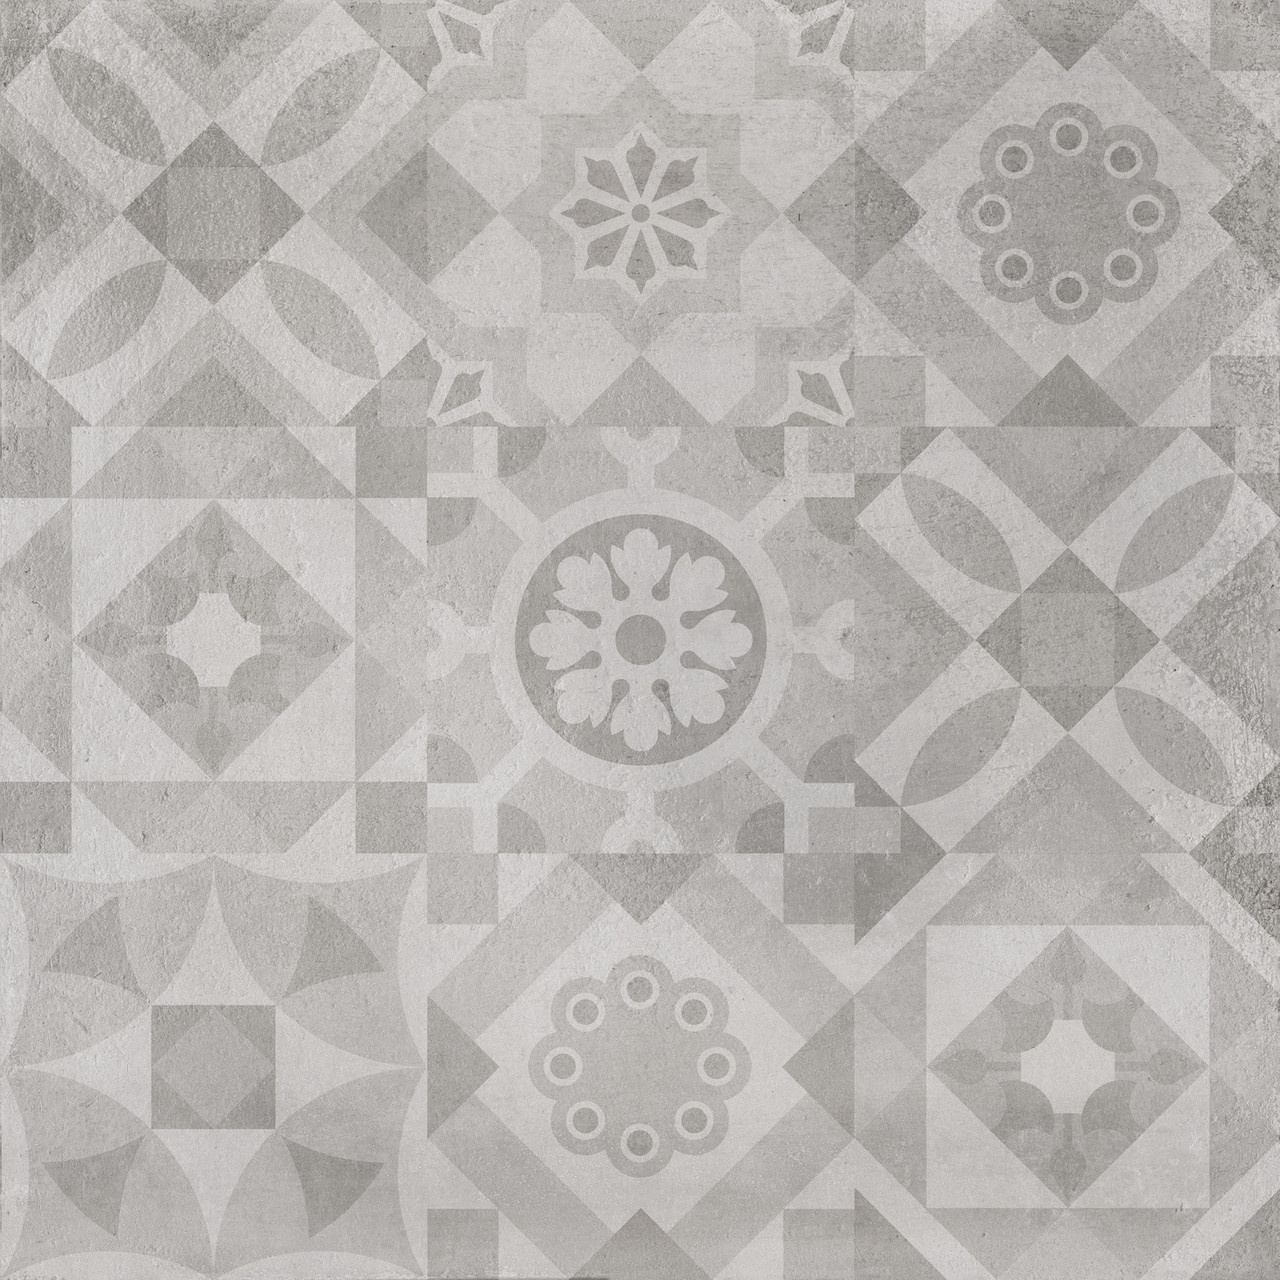 Плитка для підлоги Concrete Patchwork айс 600x600x10 мм